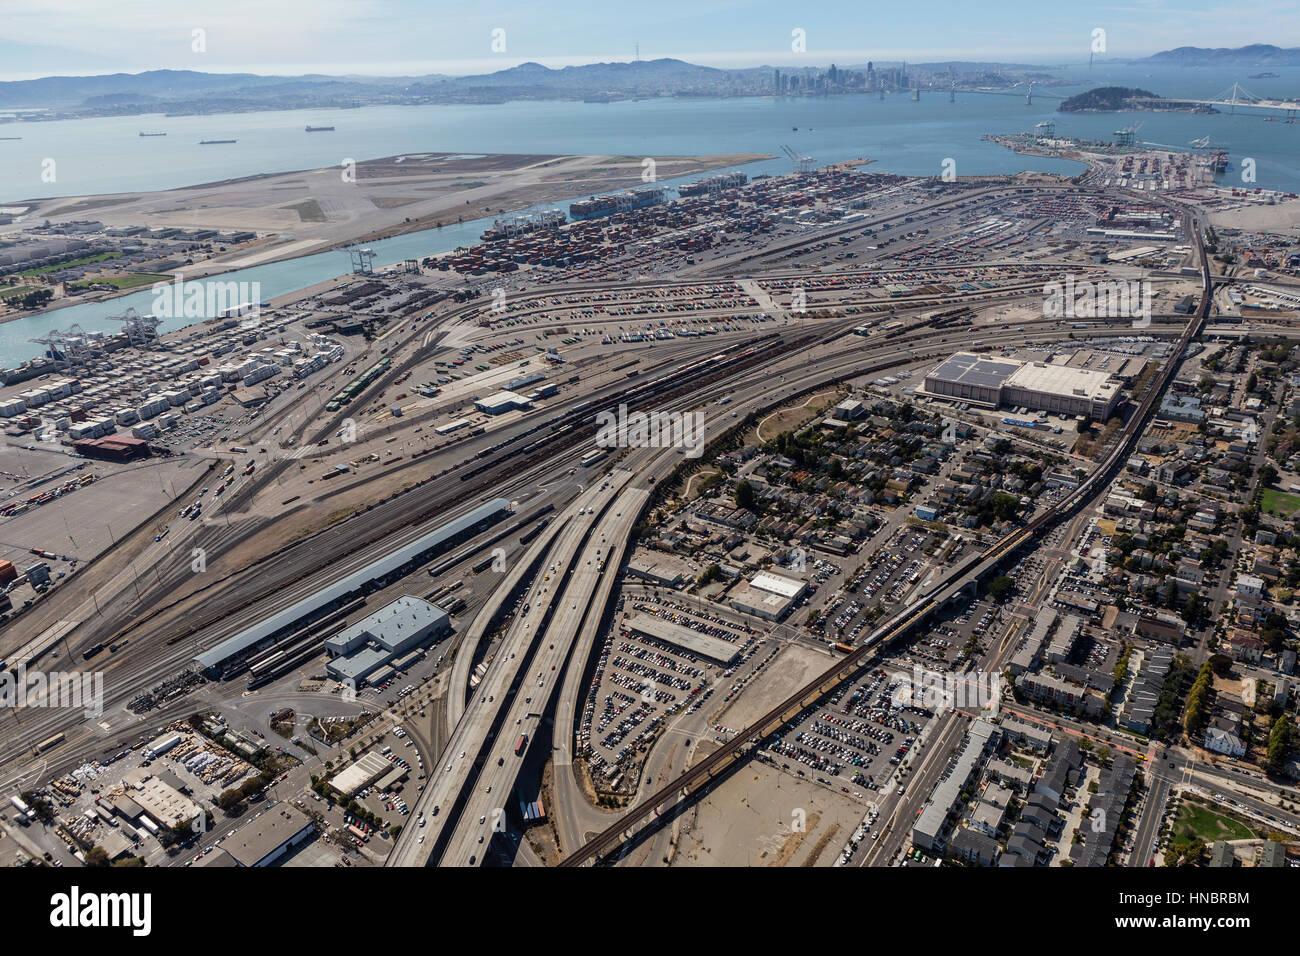 Oakland, California, USA - September 19, 2016:  Aerial view of San Francisco Bay, Alameda Island and Oakland Harbor. - Stock Image